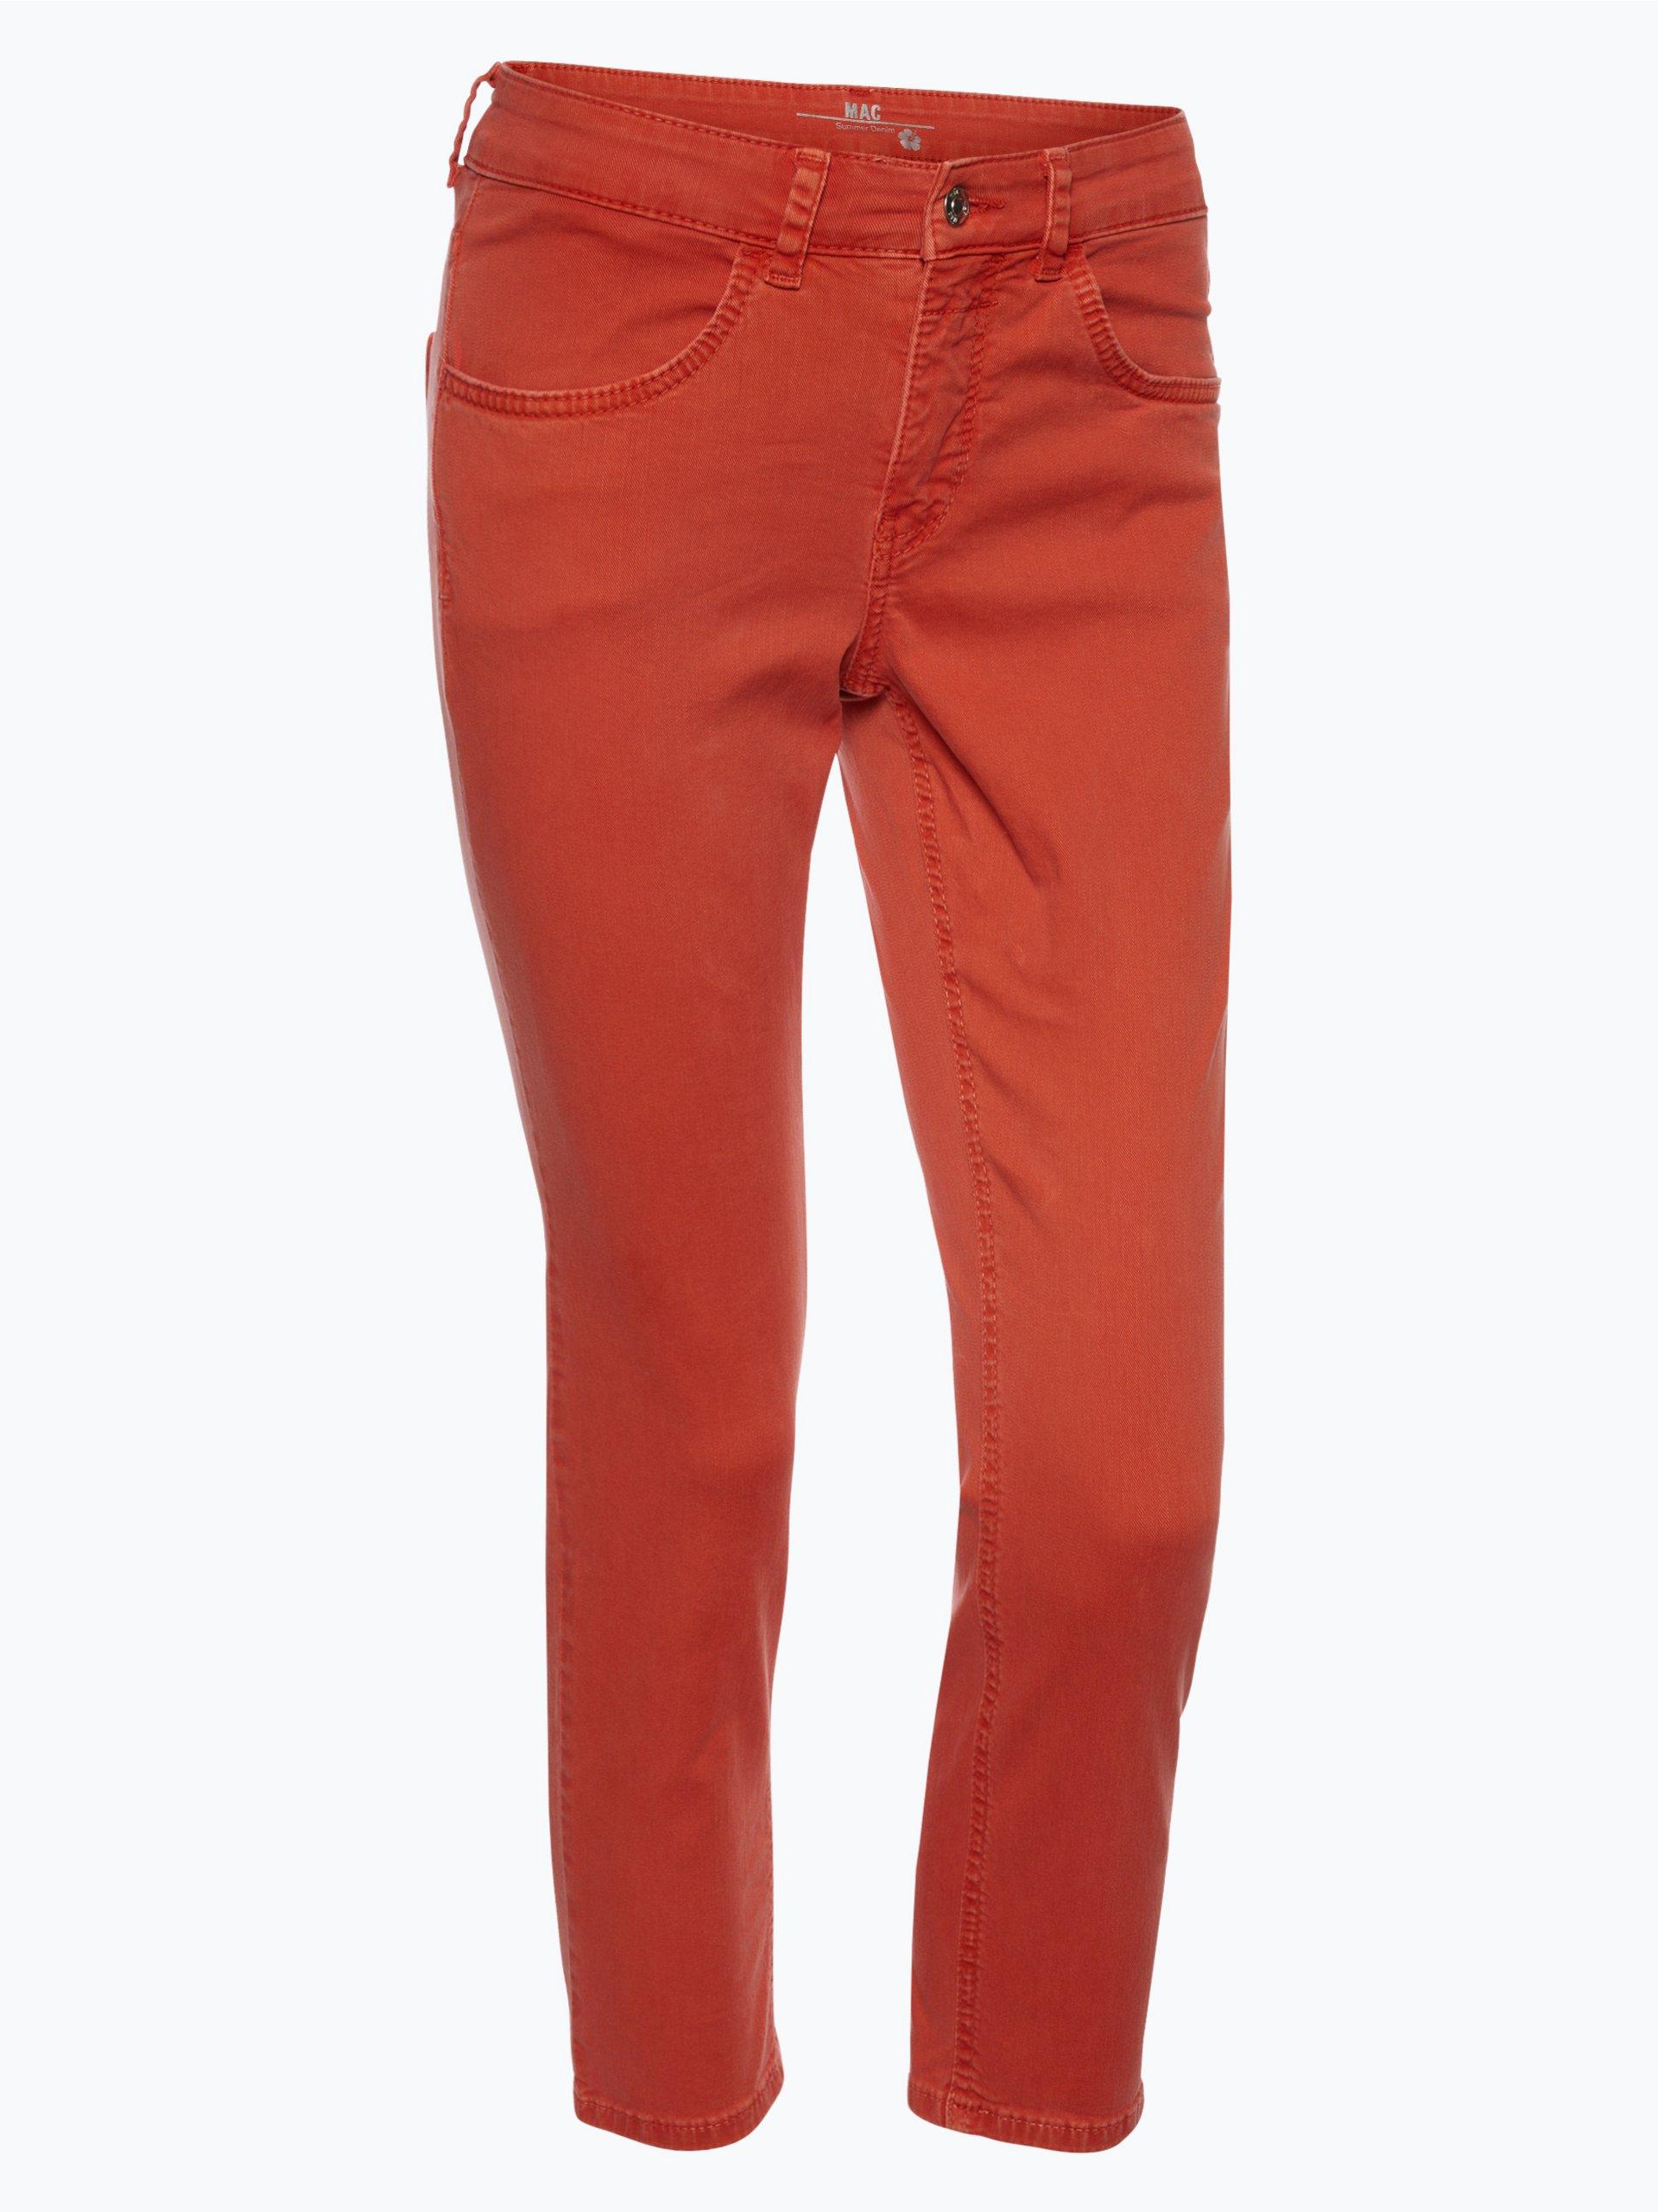 MAC Damen Jeans - Angela 7/8